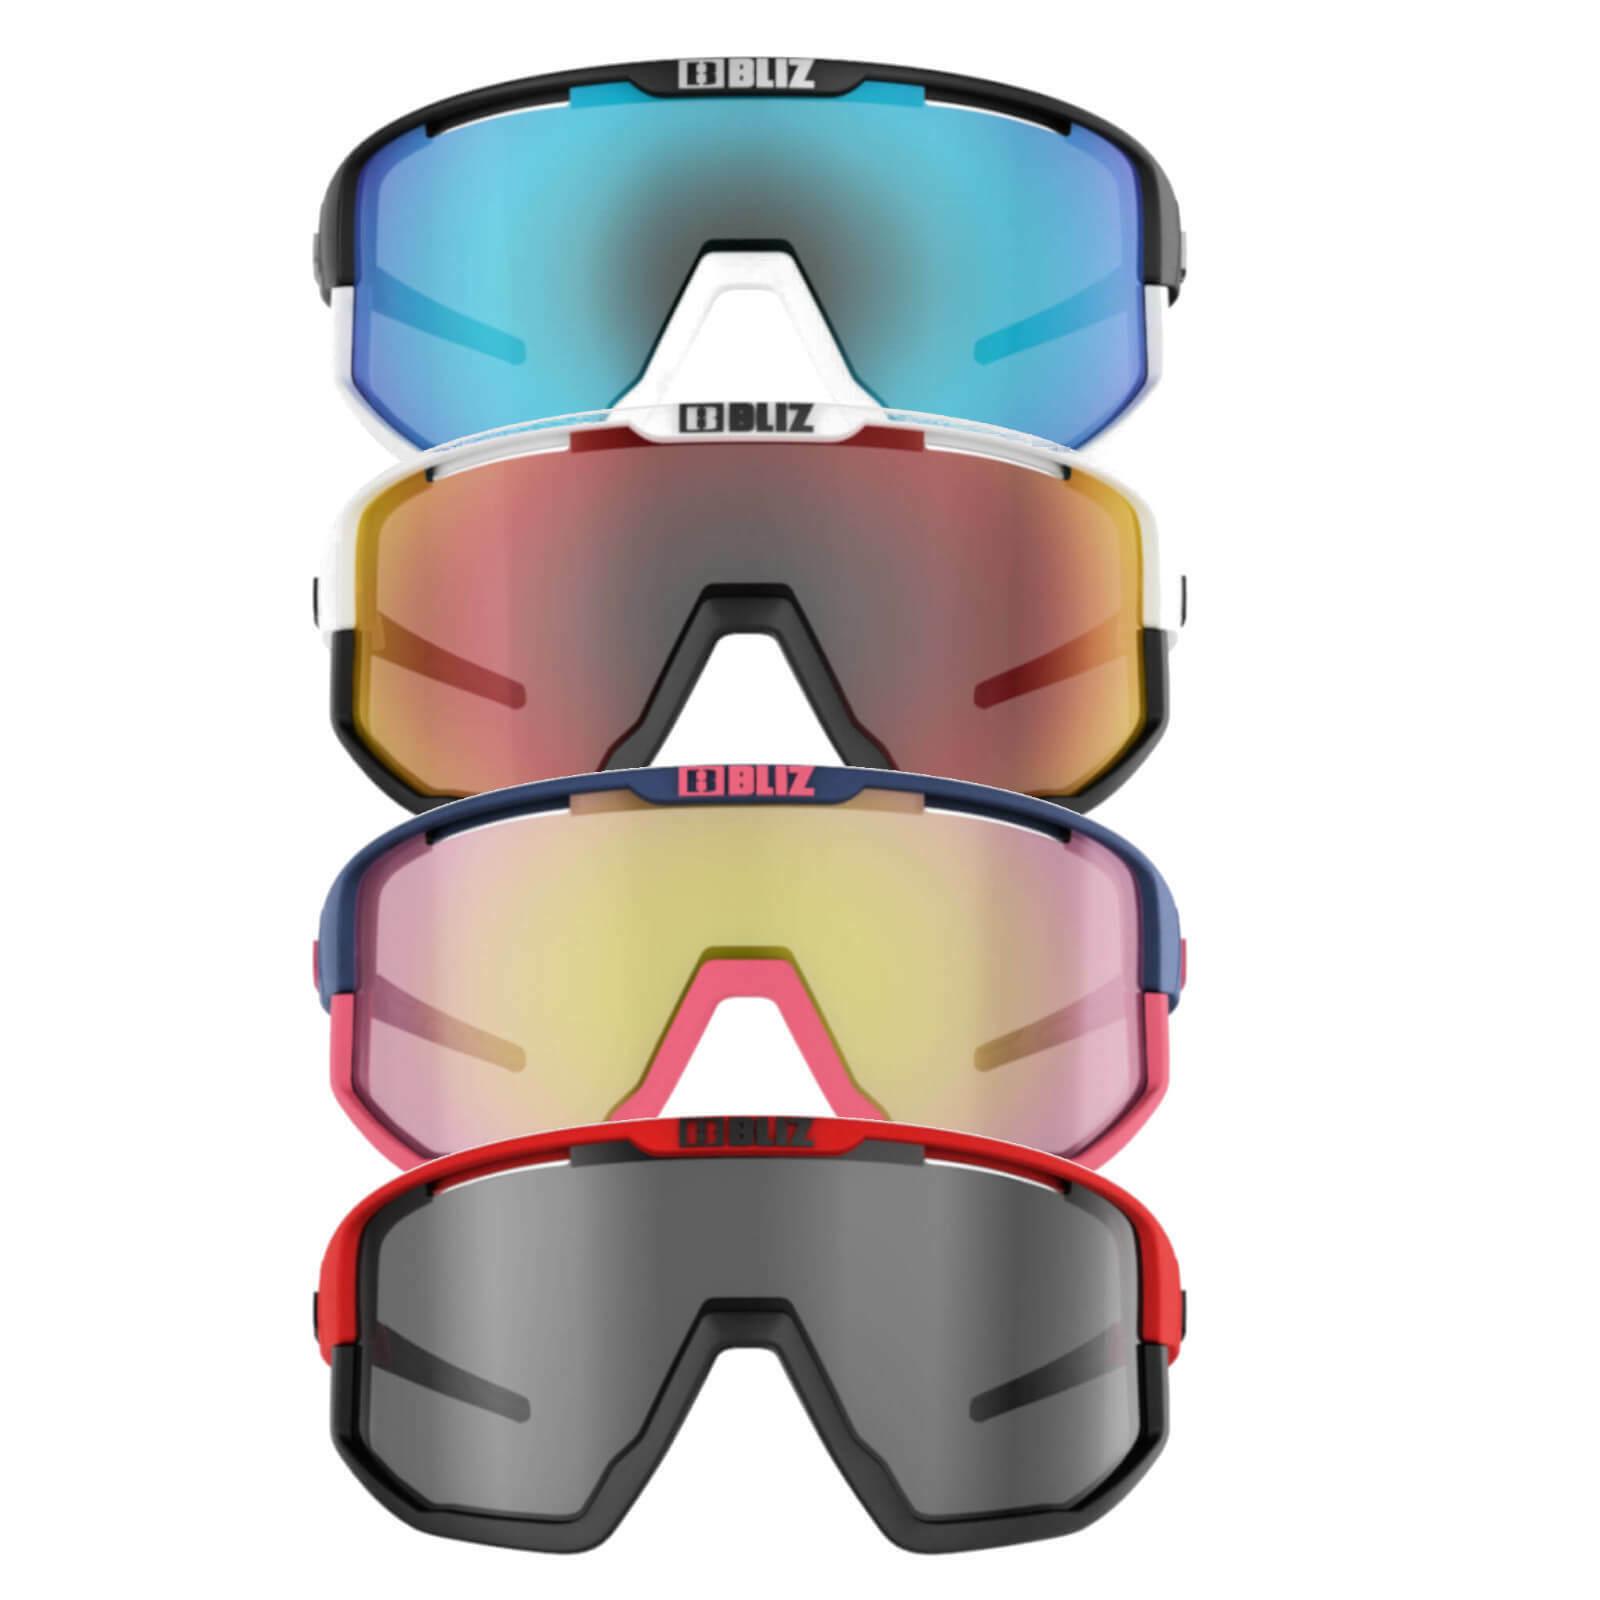 Bliz Unisex Sport-Sonnenbrille Sportbrille Fahrradbrille Fusion